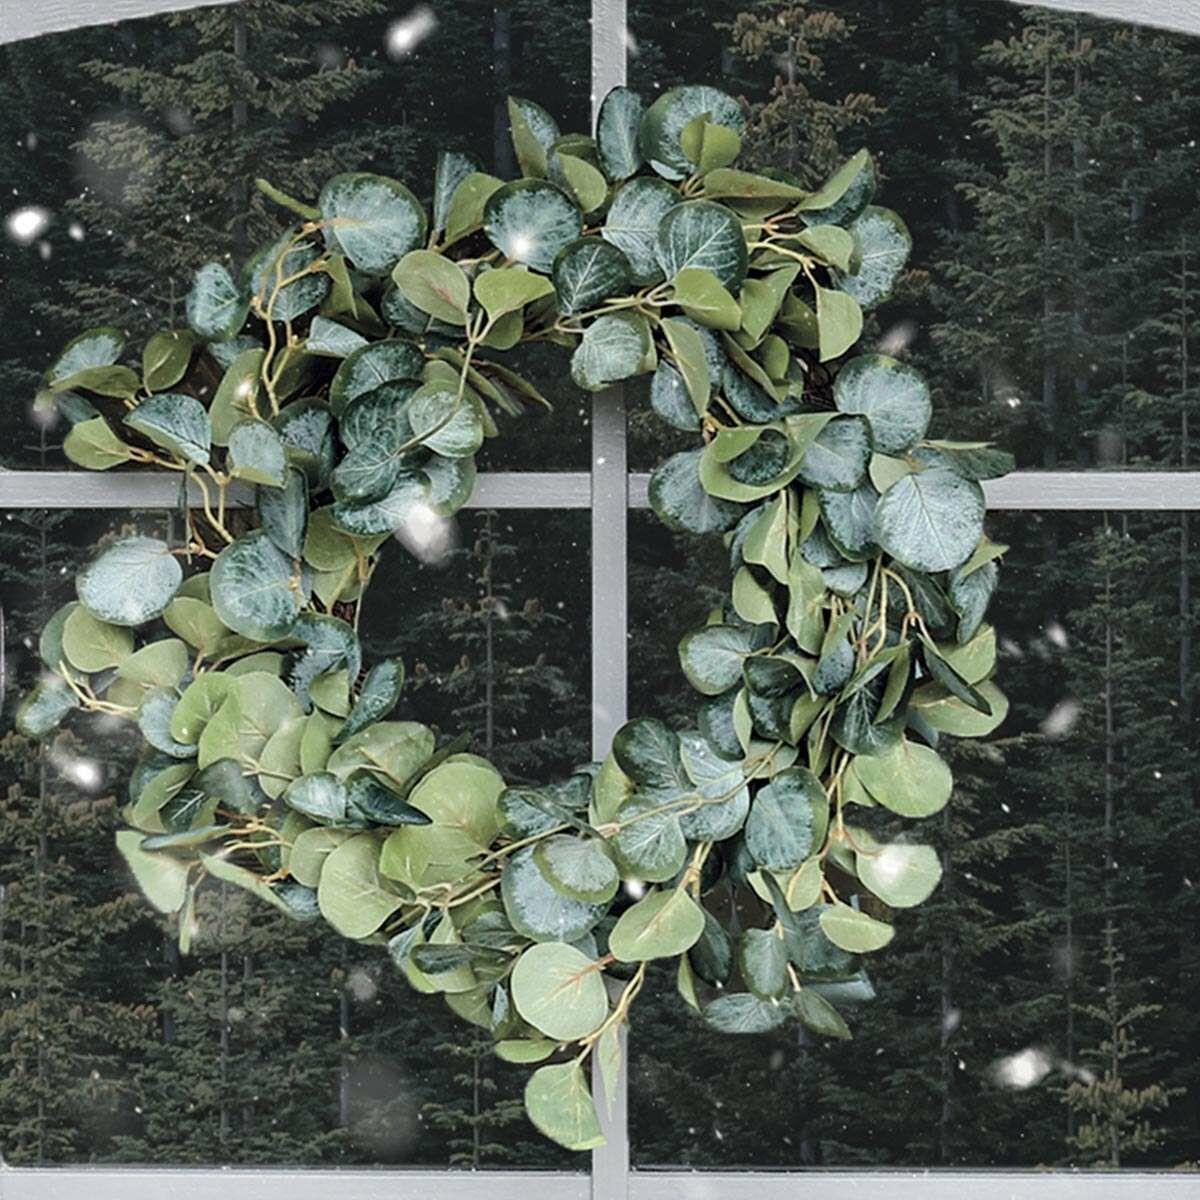 37cm Outdoor Eucalyptus Christmas Wreath